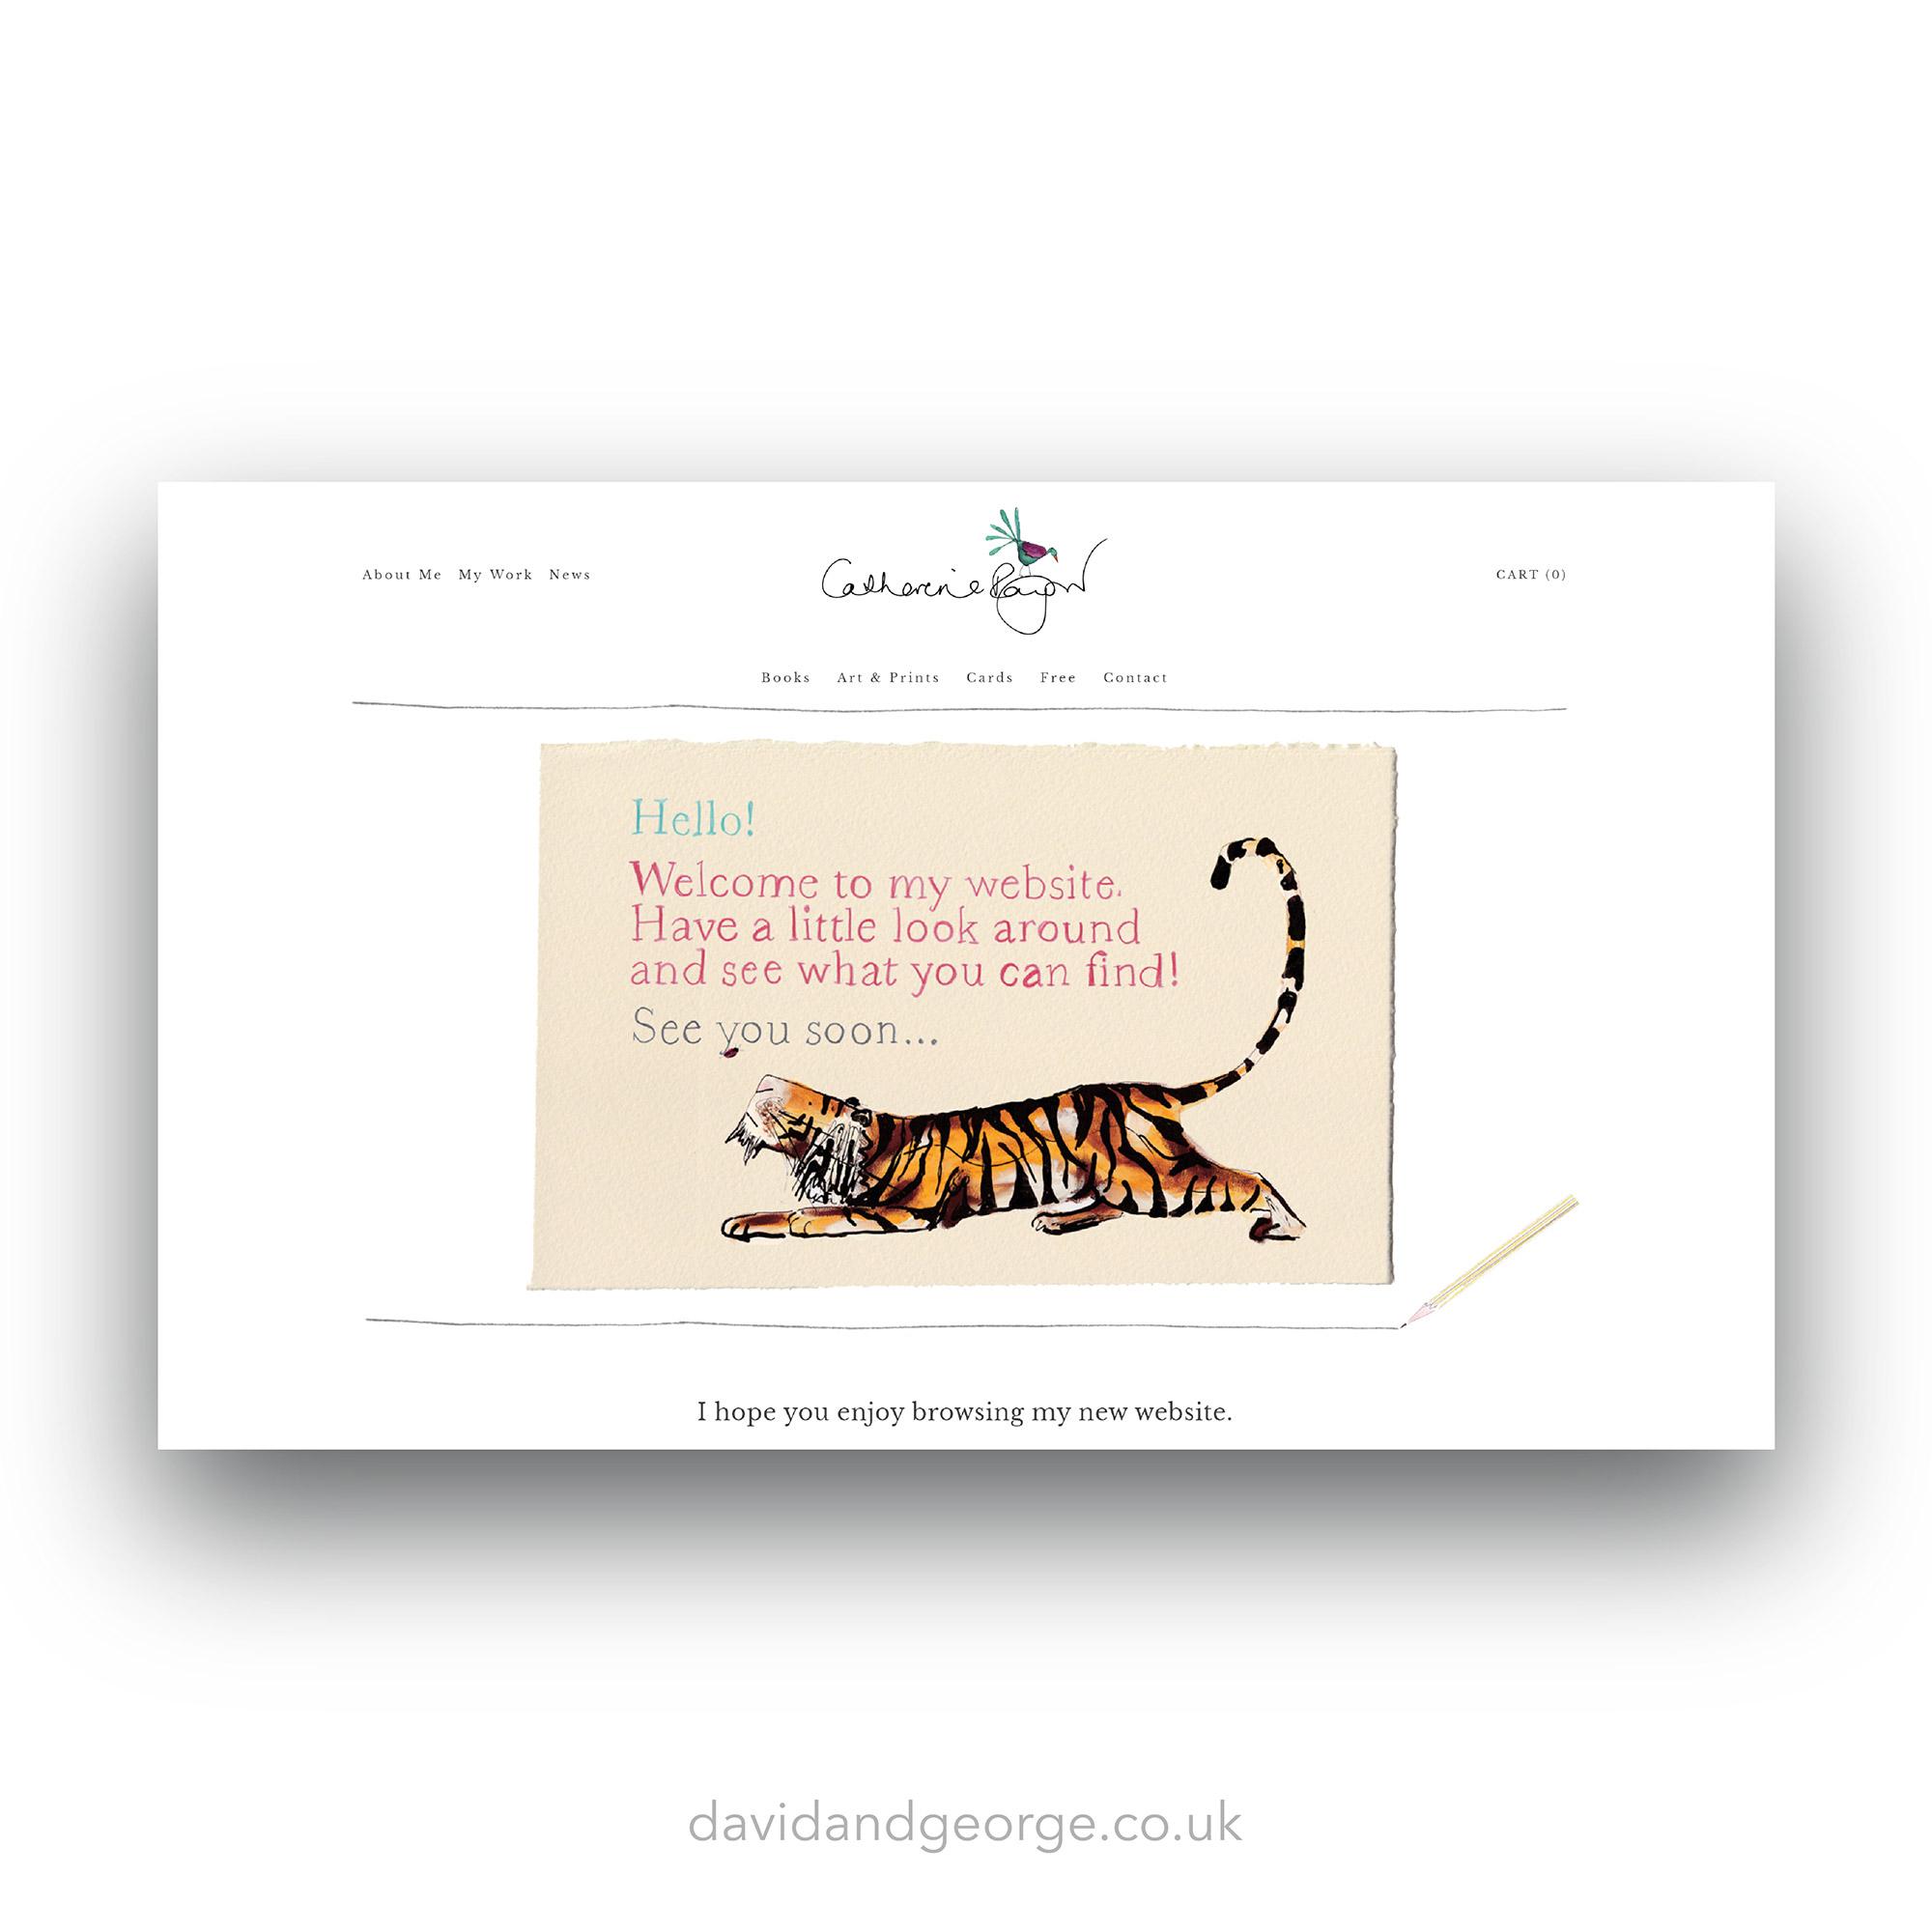 squarespace-website-design-london-edinburgh-uk-david-and-george-catherine-rayner-childrens-book-illustrator.jpg